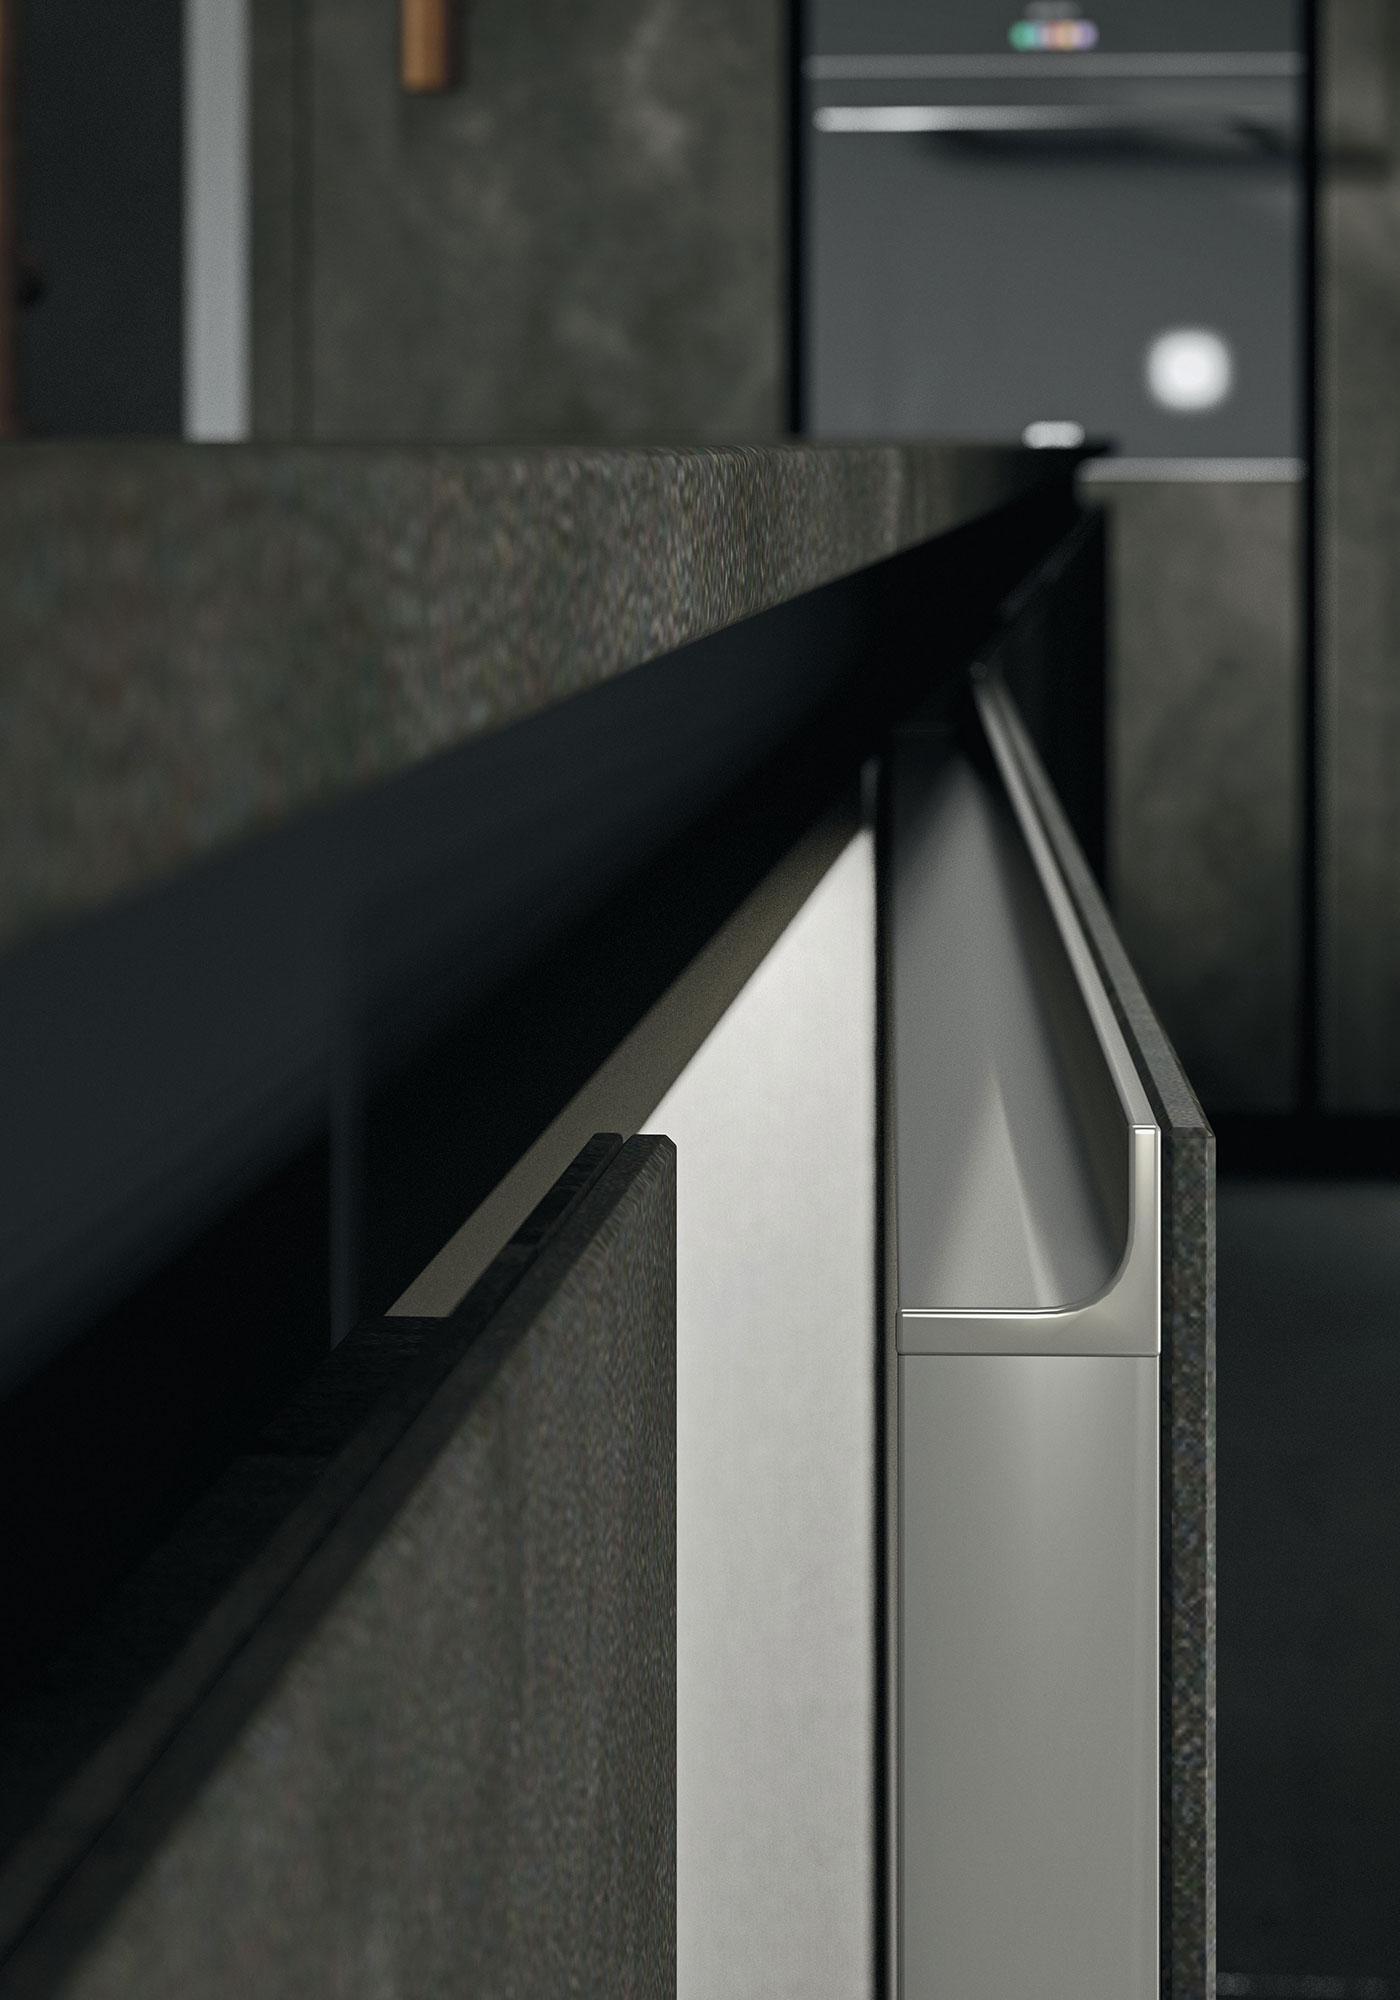 cucine-design-moderne-way-materia-snaidero-dettaglio-8